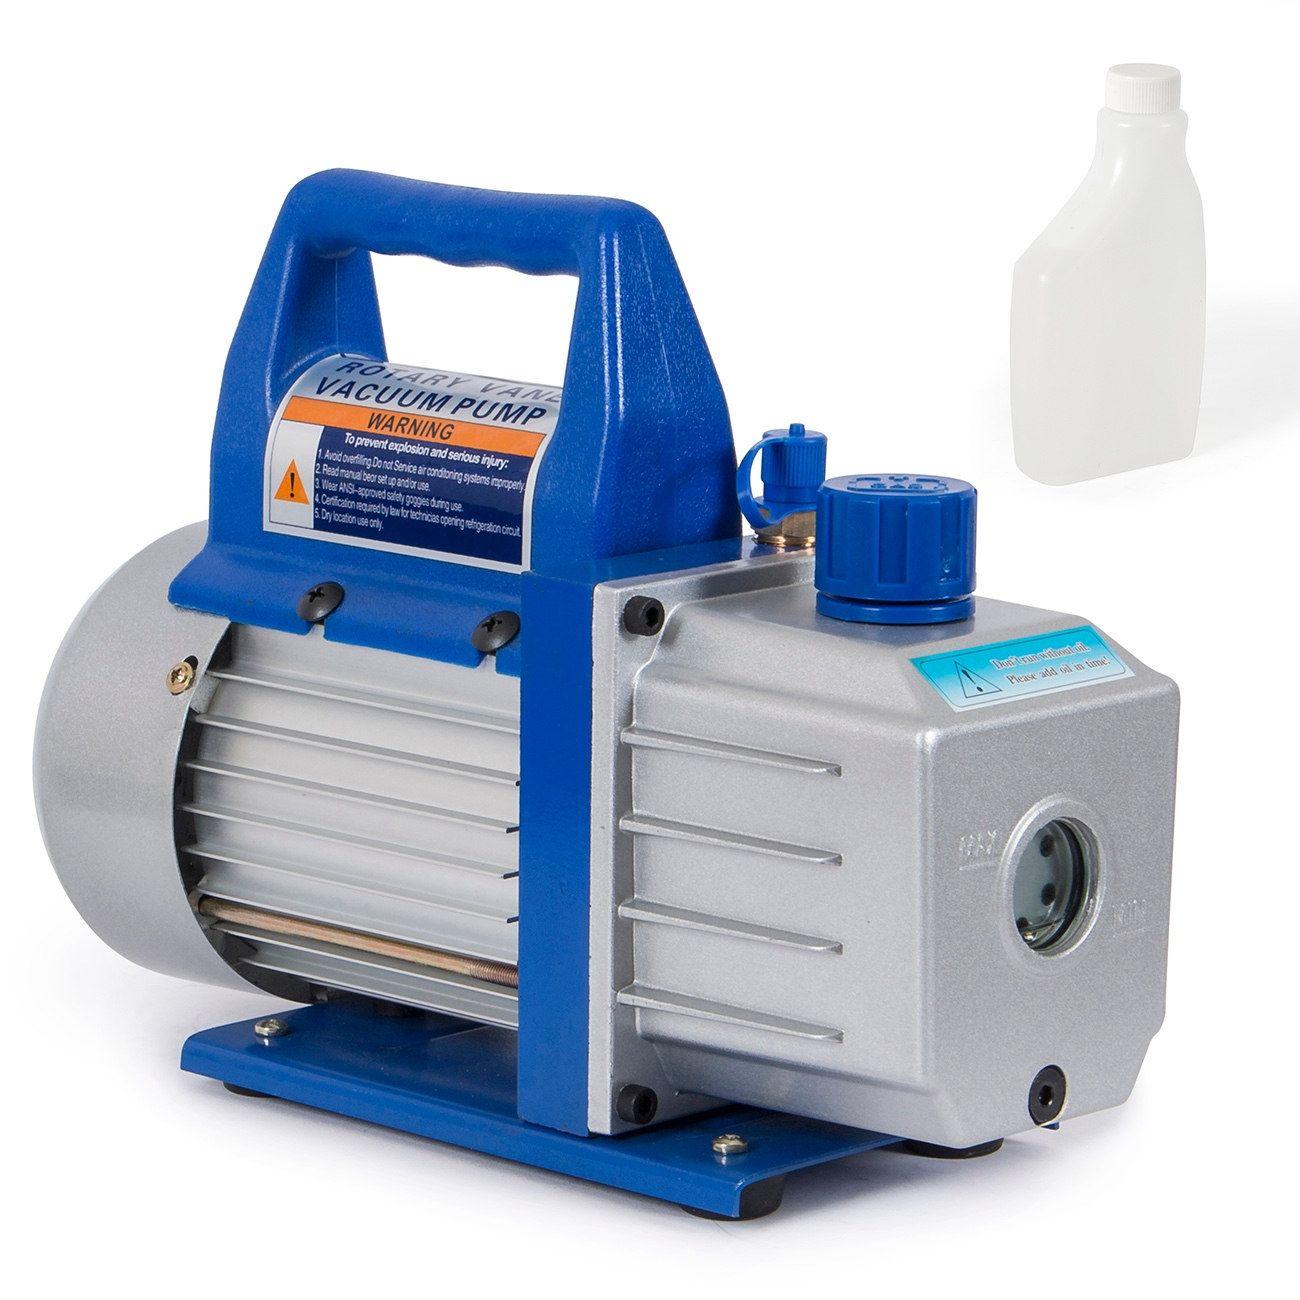 Arksen Rotary Vane Deep Vacuum Pump, 110v, 1/3HP, 4 CFM, Silver